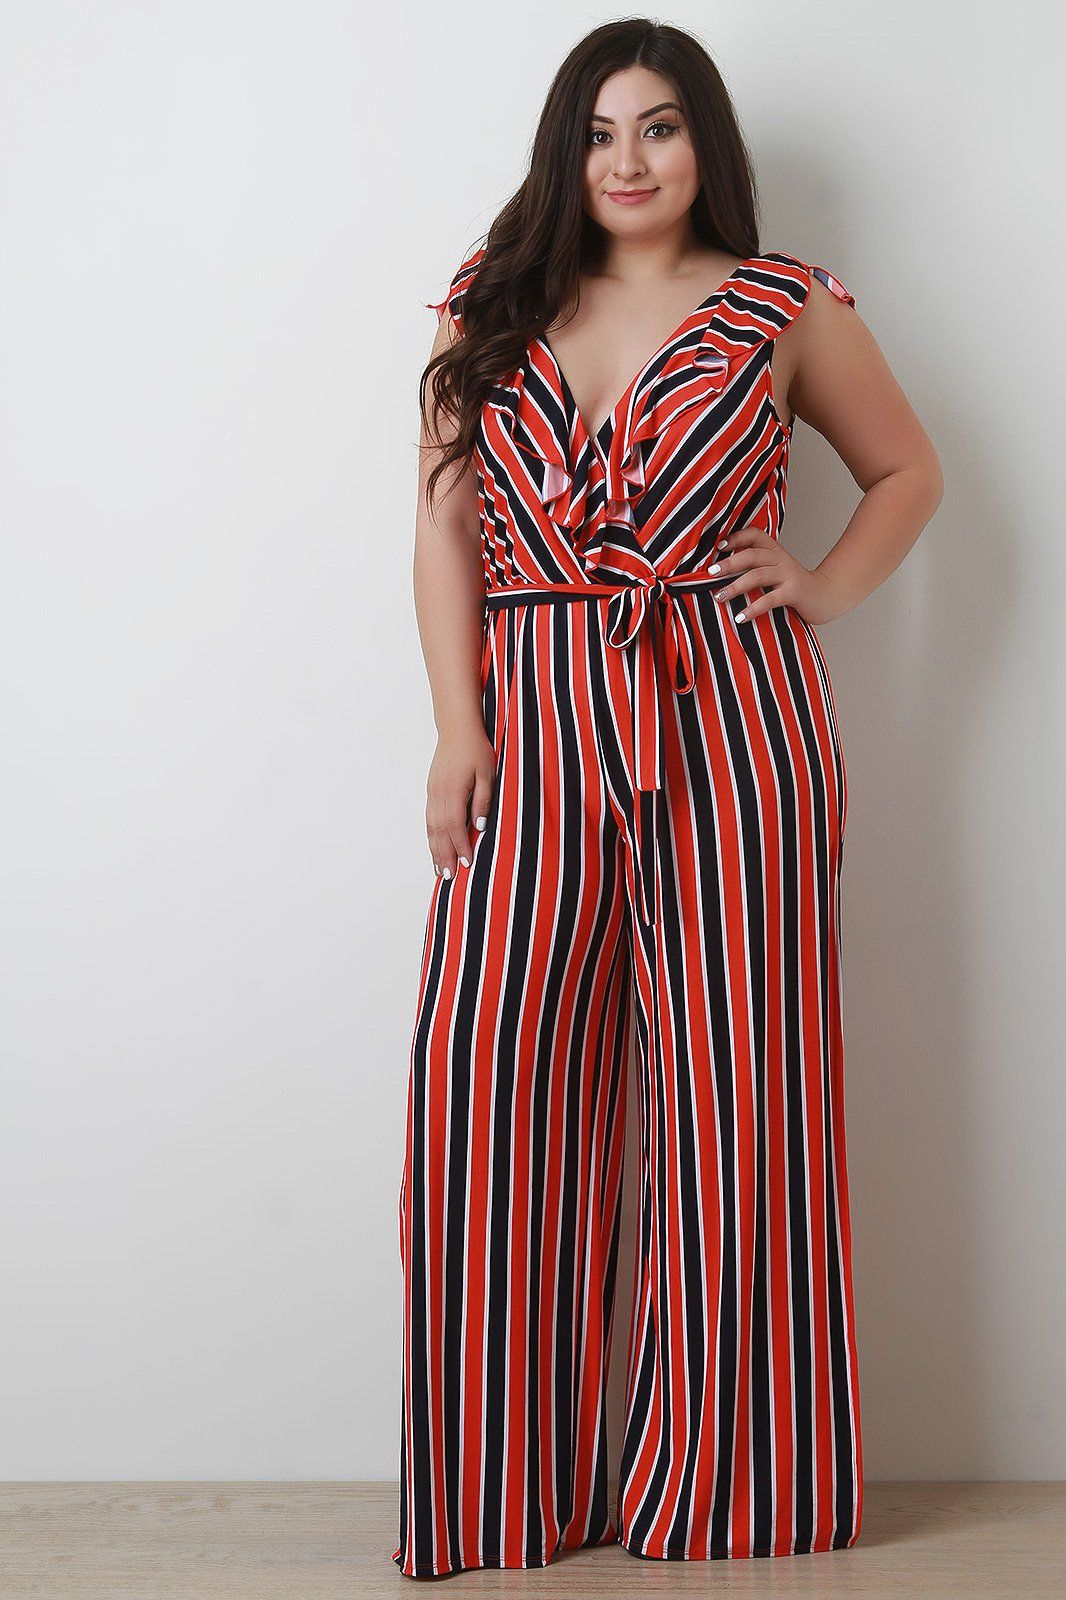 912b22f98b1 This plus size jumpsuit features bold stripes design